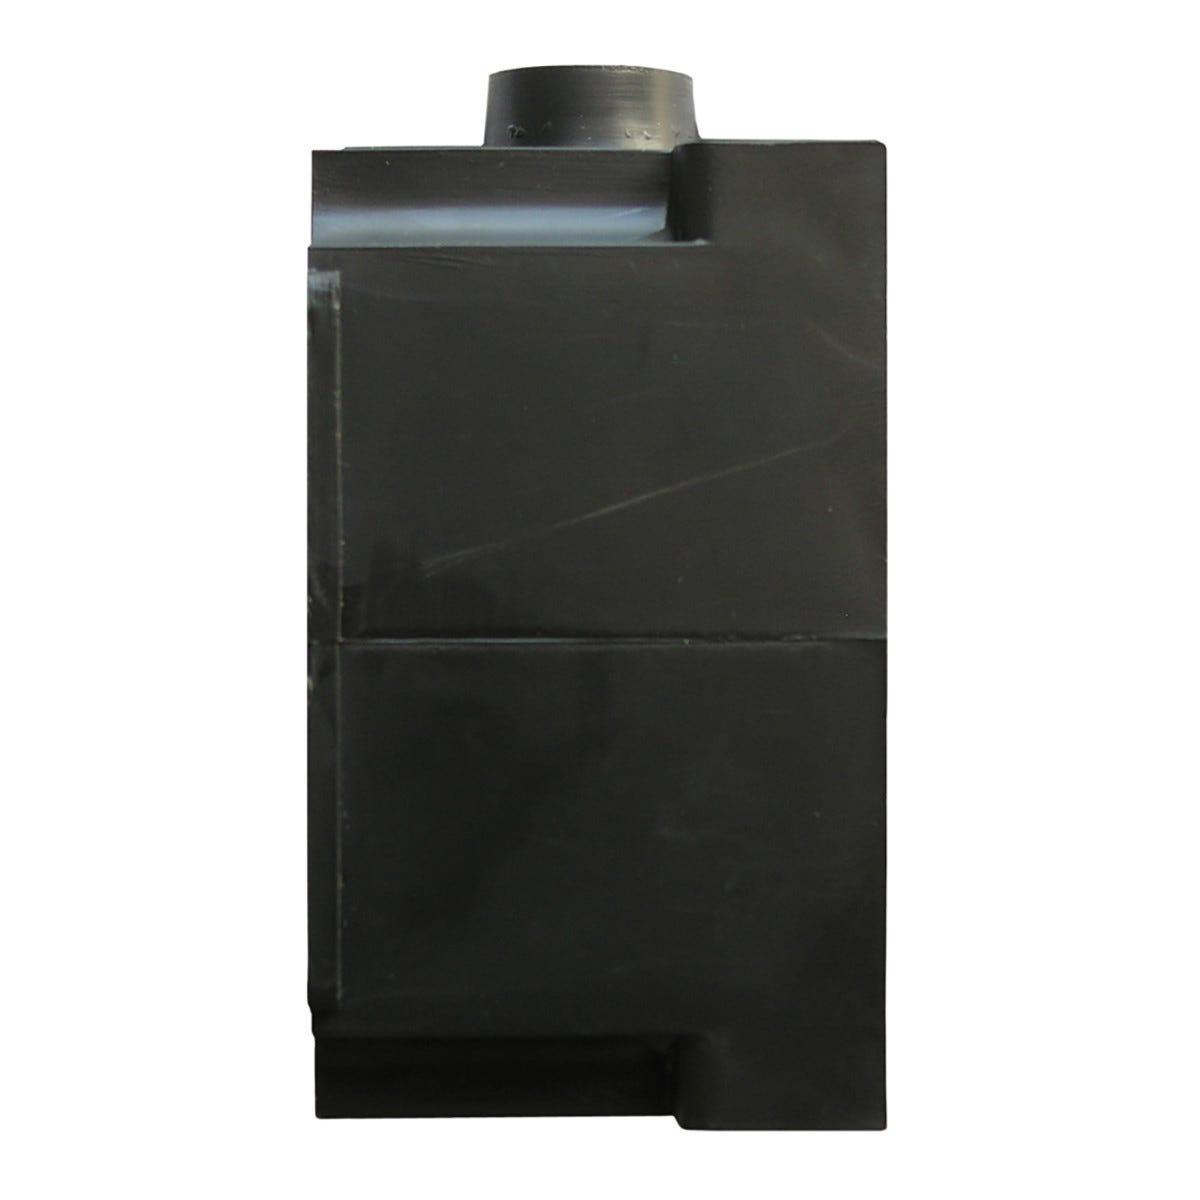 cassetta tipo c portata 40 kg interasse 72 mm pvc